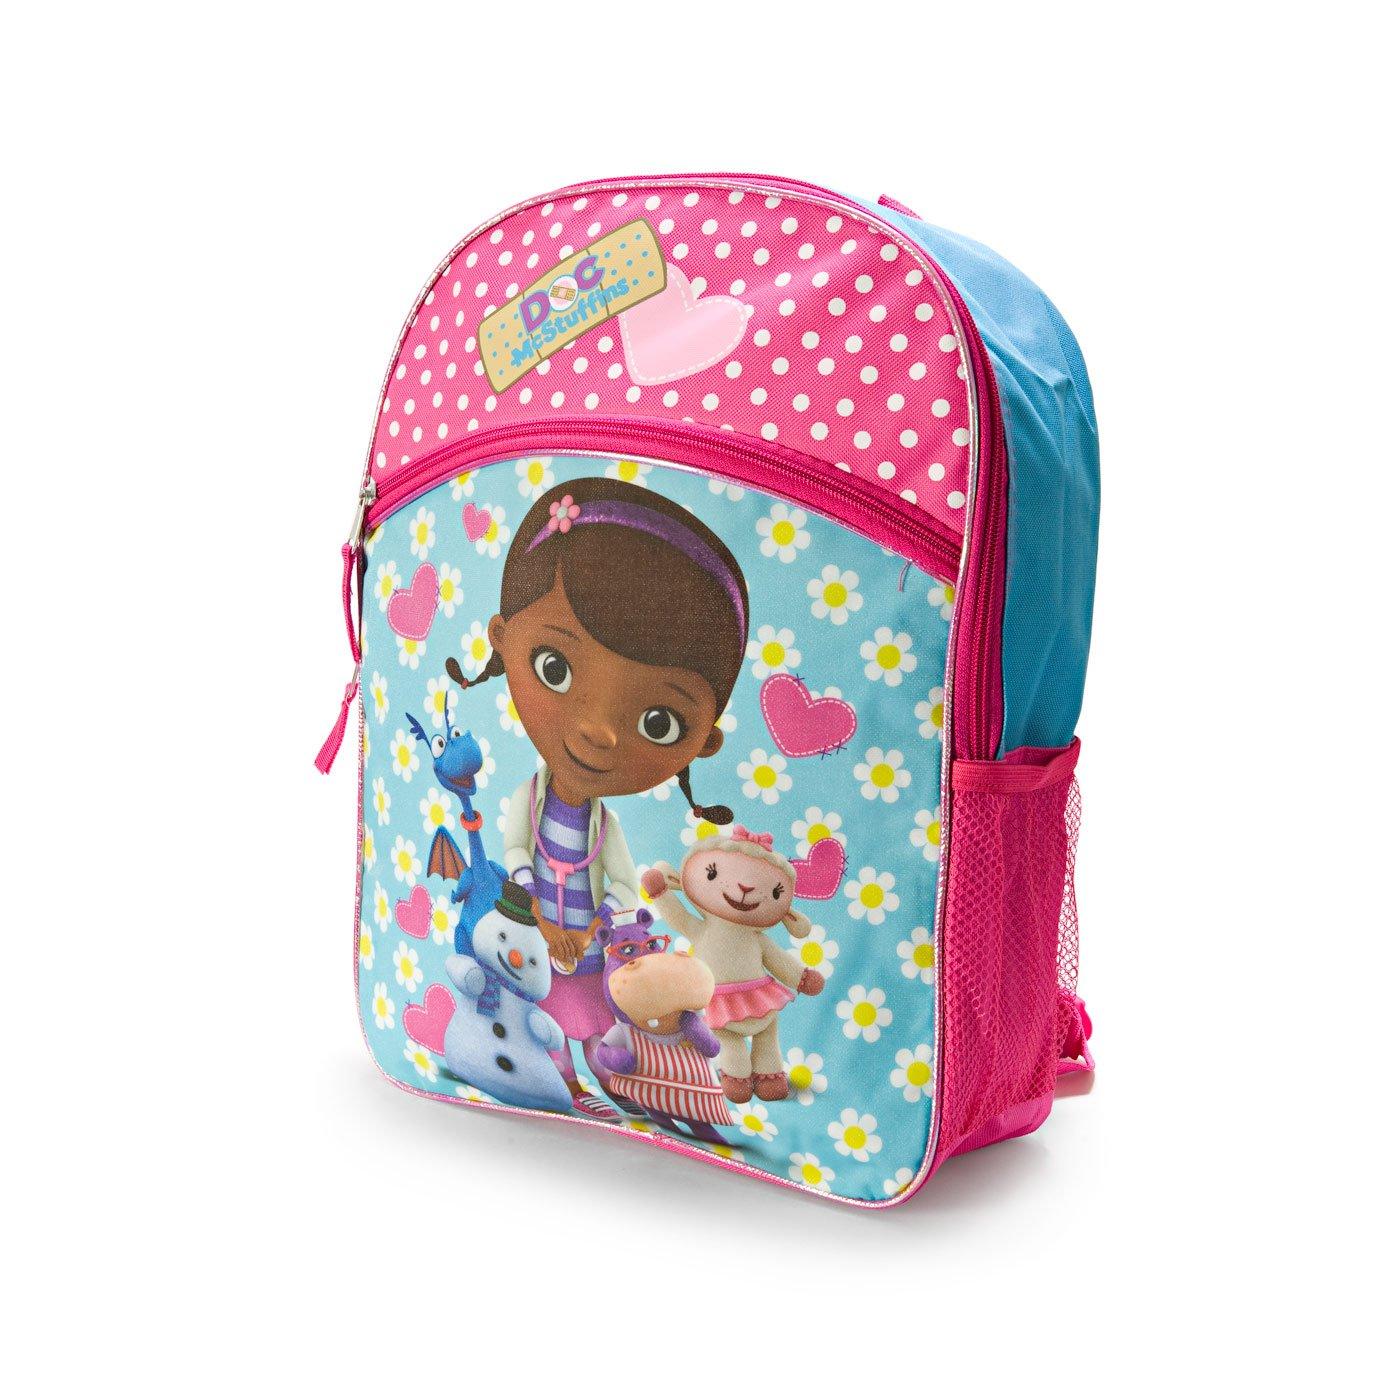 cd5f842a2aa Amazon.com  Disney Junior Doc McStuffins Large Pink Backpack  Toys   Games